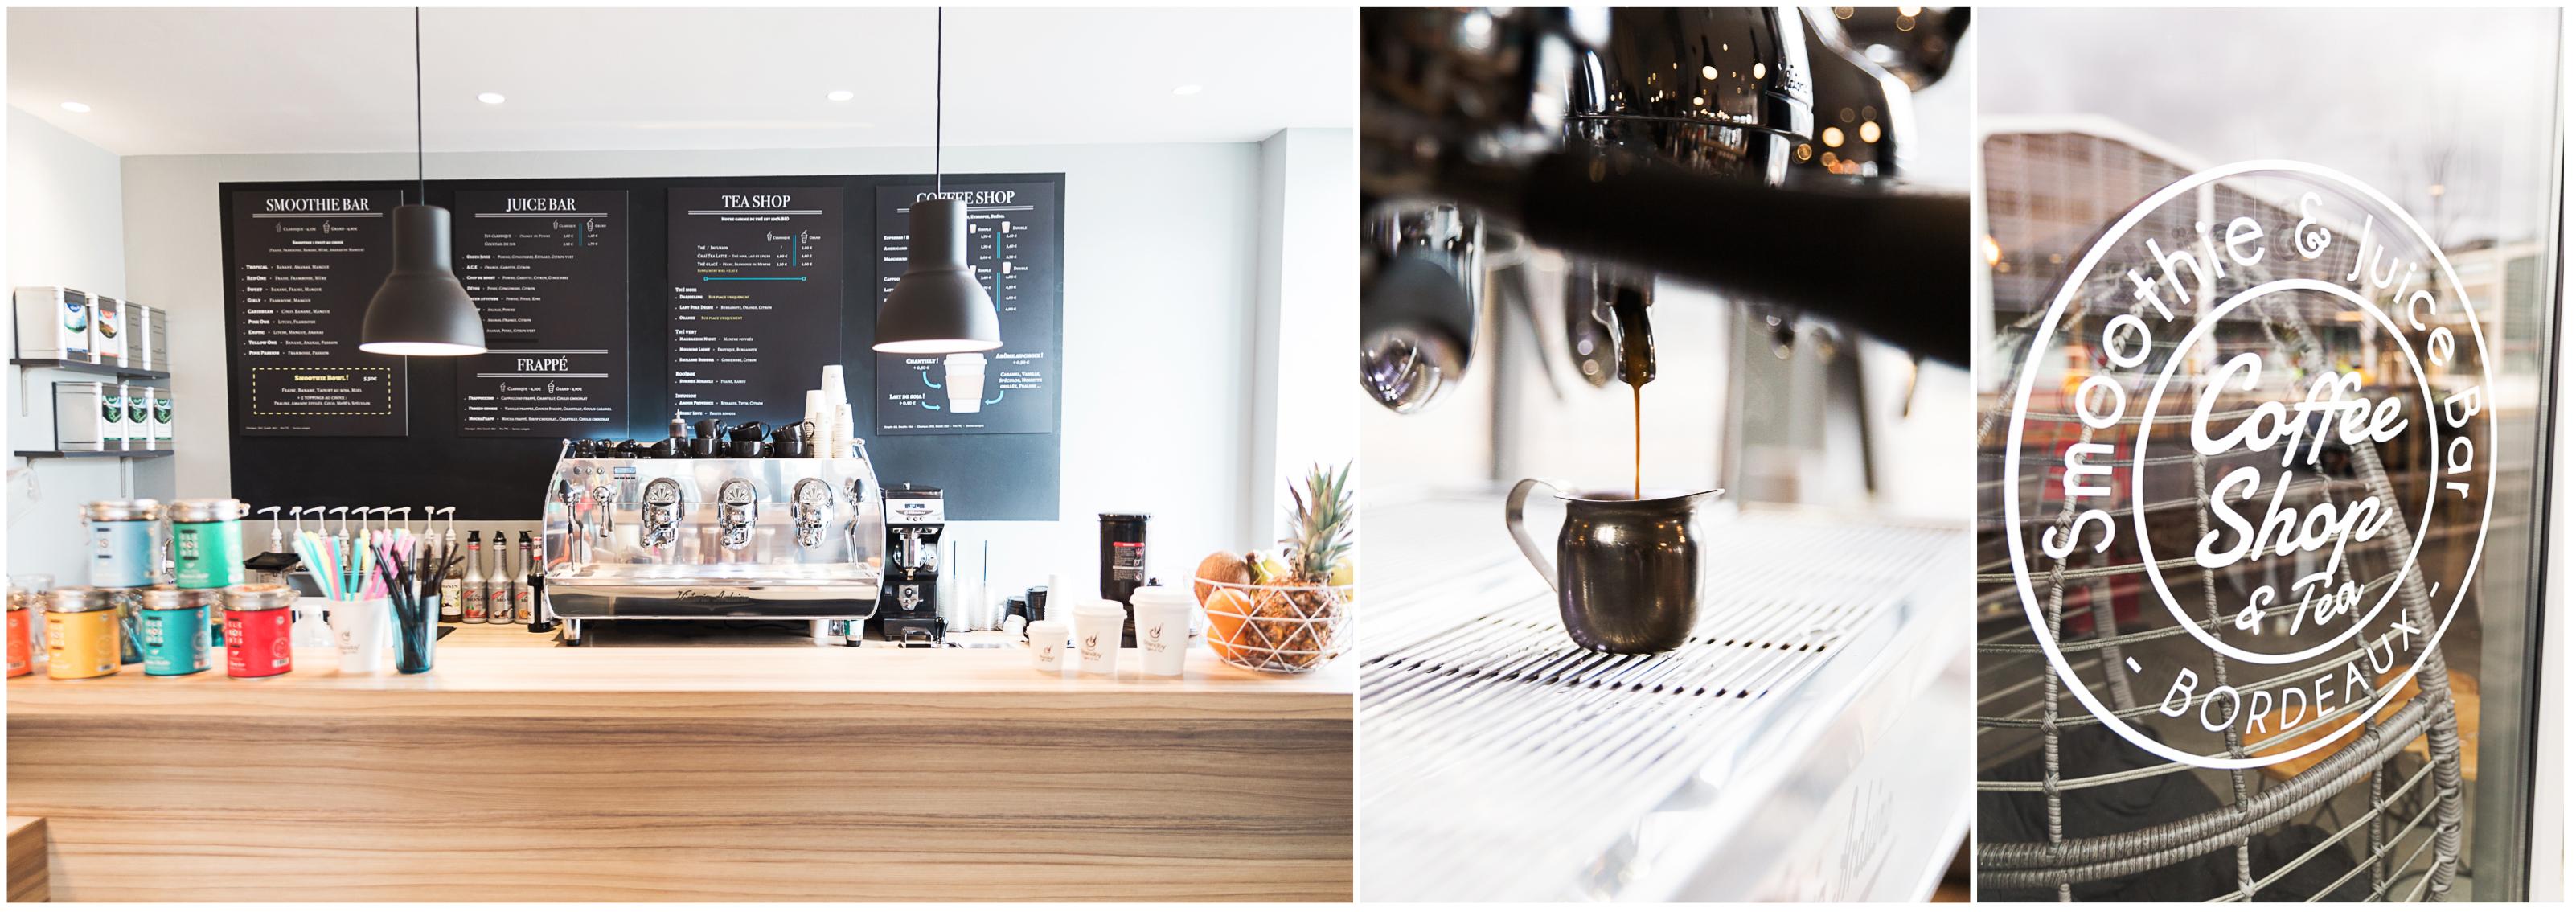 standbycoffee-bordeaux-emeline-mingot-photographe